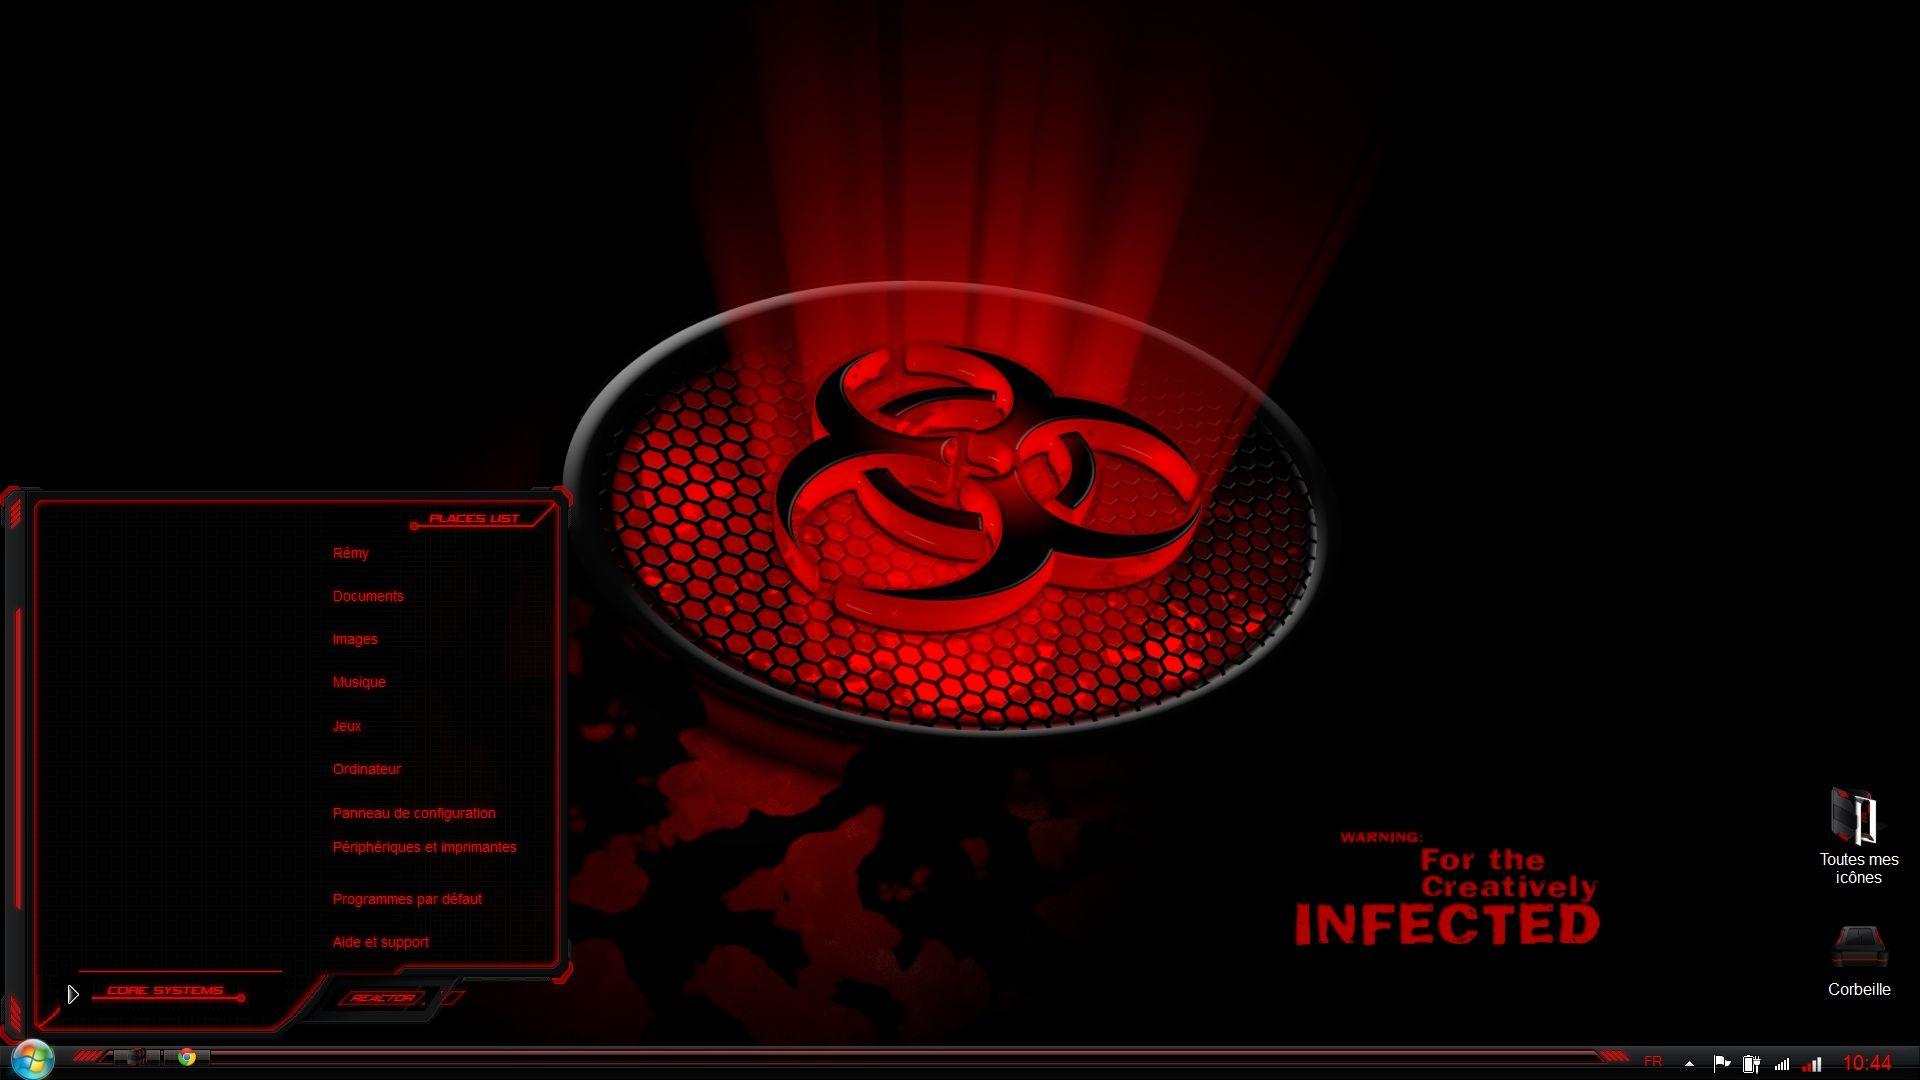 Prächtig Alienware Red Wallpaper - WallpaperSafari &SL_63